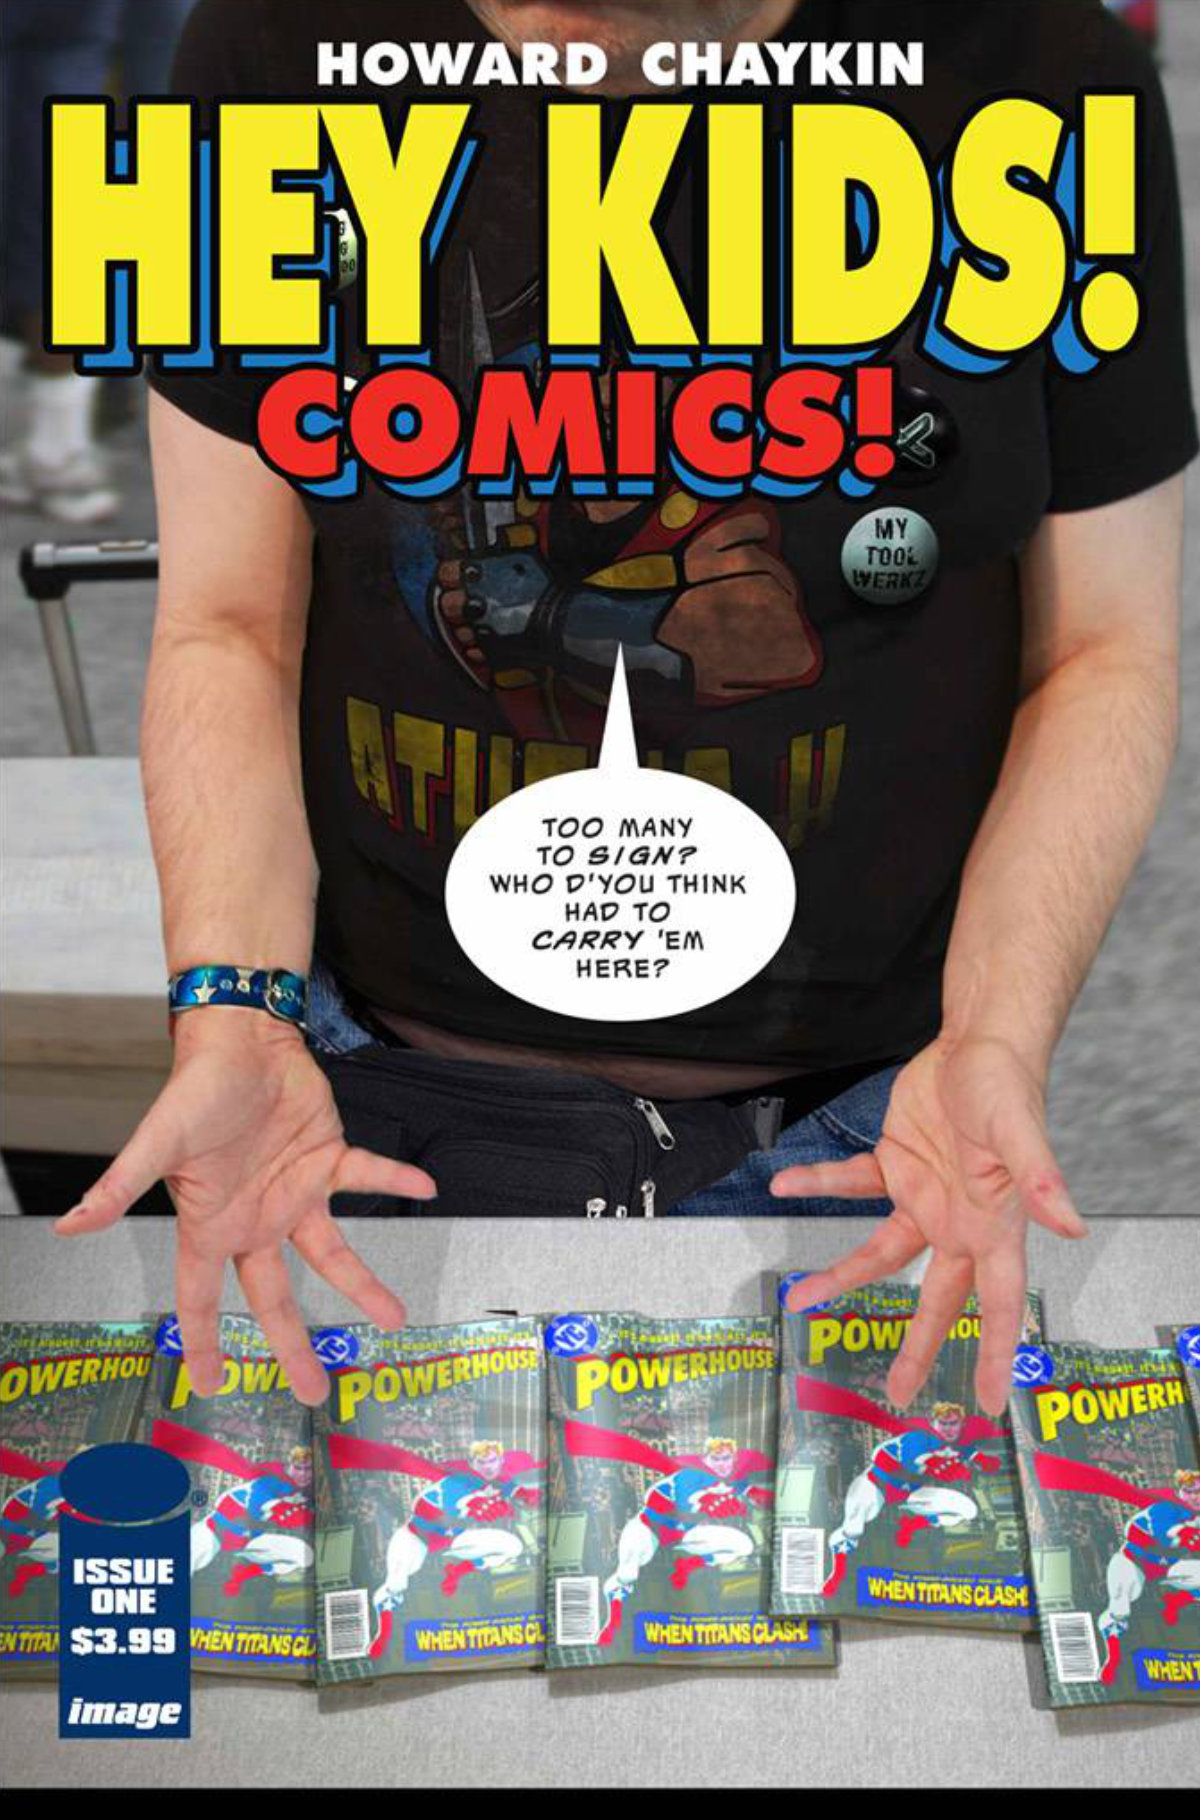 Hey Kids, Comics! By Howard Chaykin